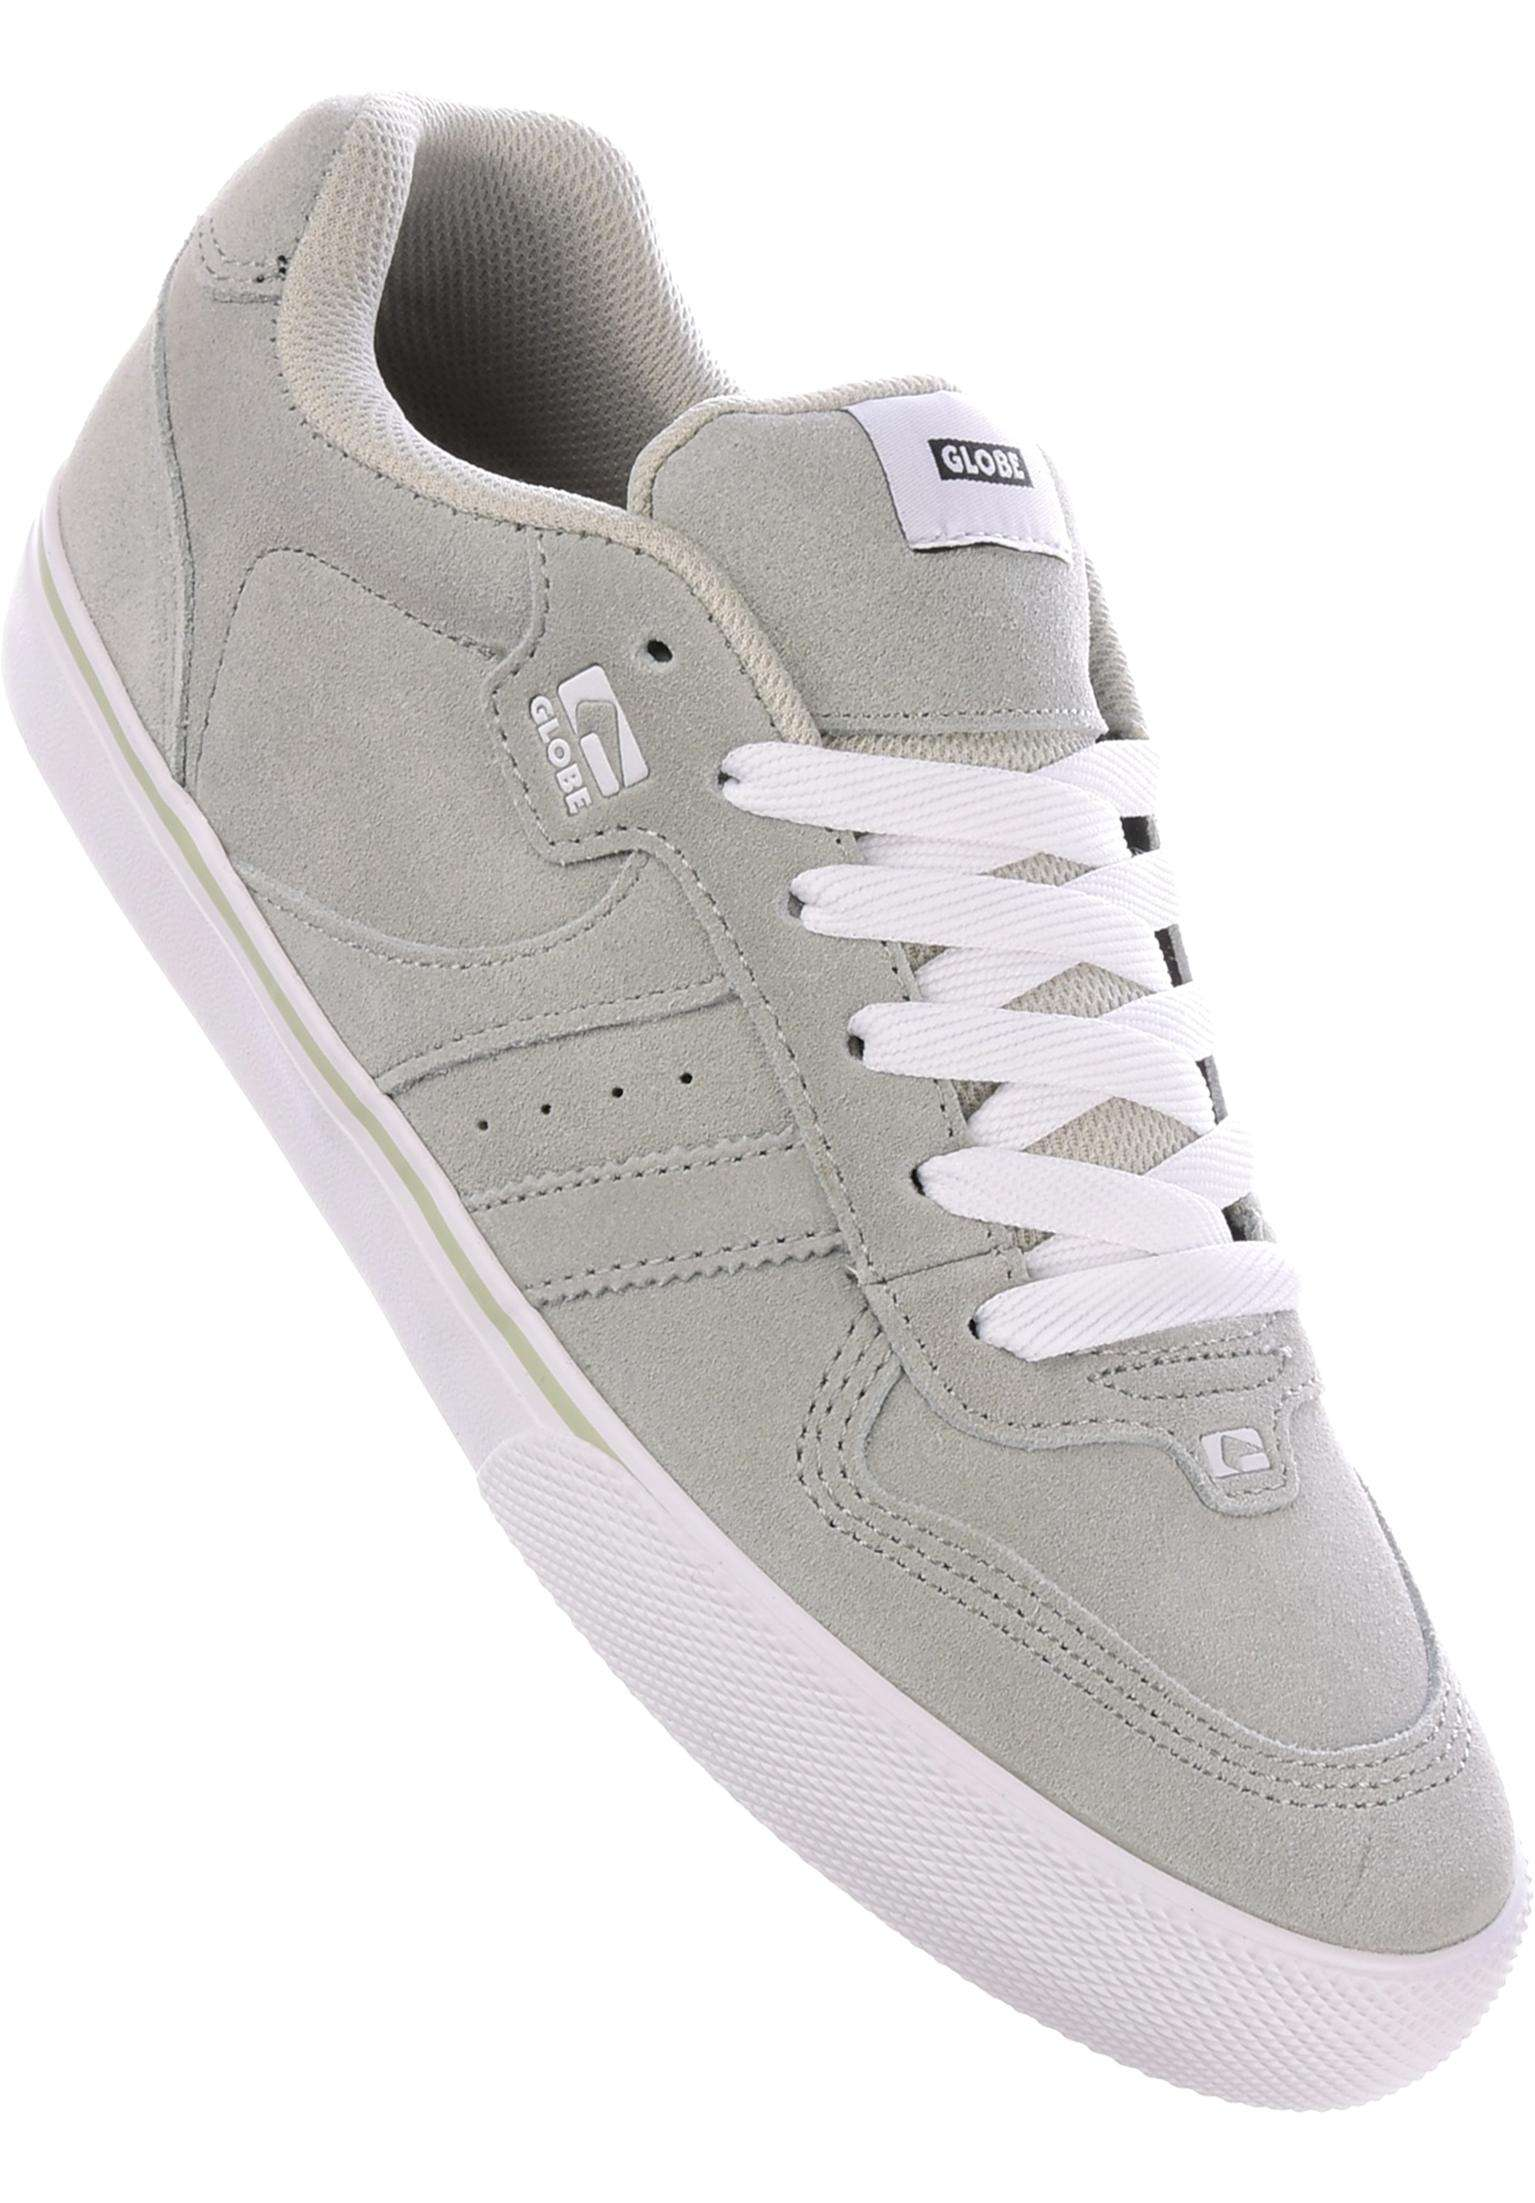 d47feb89ec597 Encore 2 Globe Alle Schuhe in grey für Herren